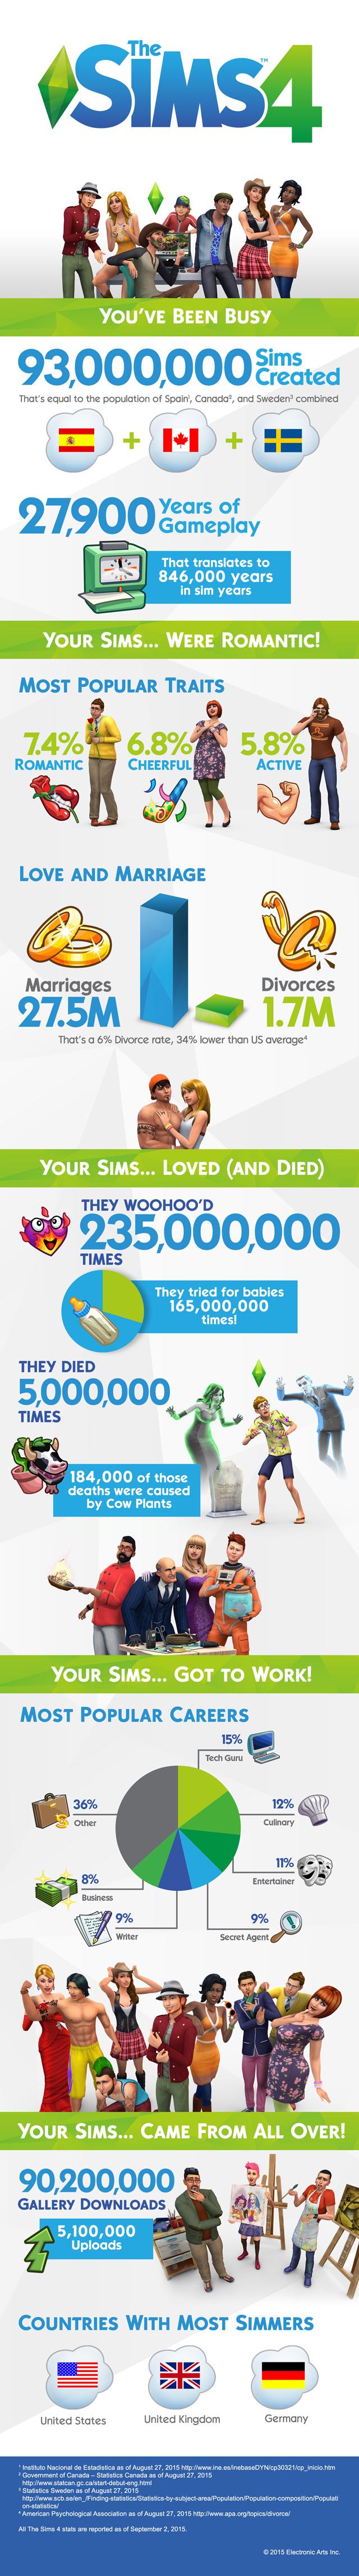 TS4_Anniversary_infographic_Final_EN